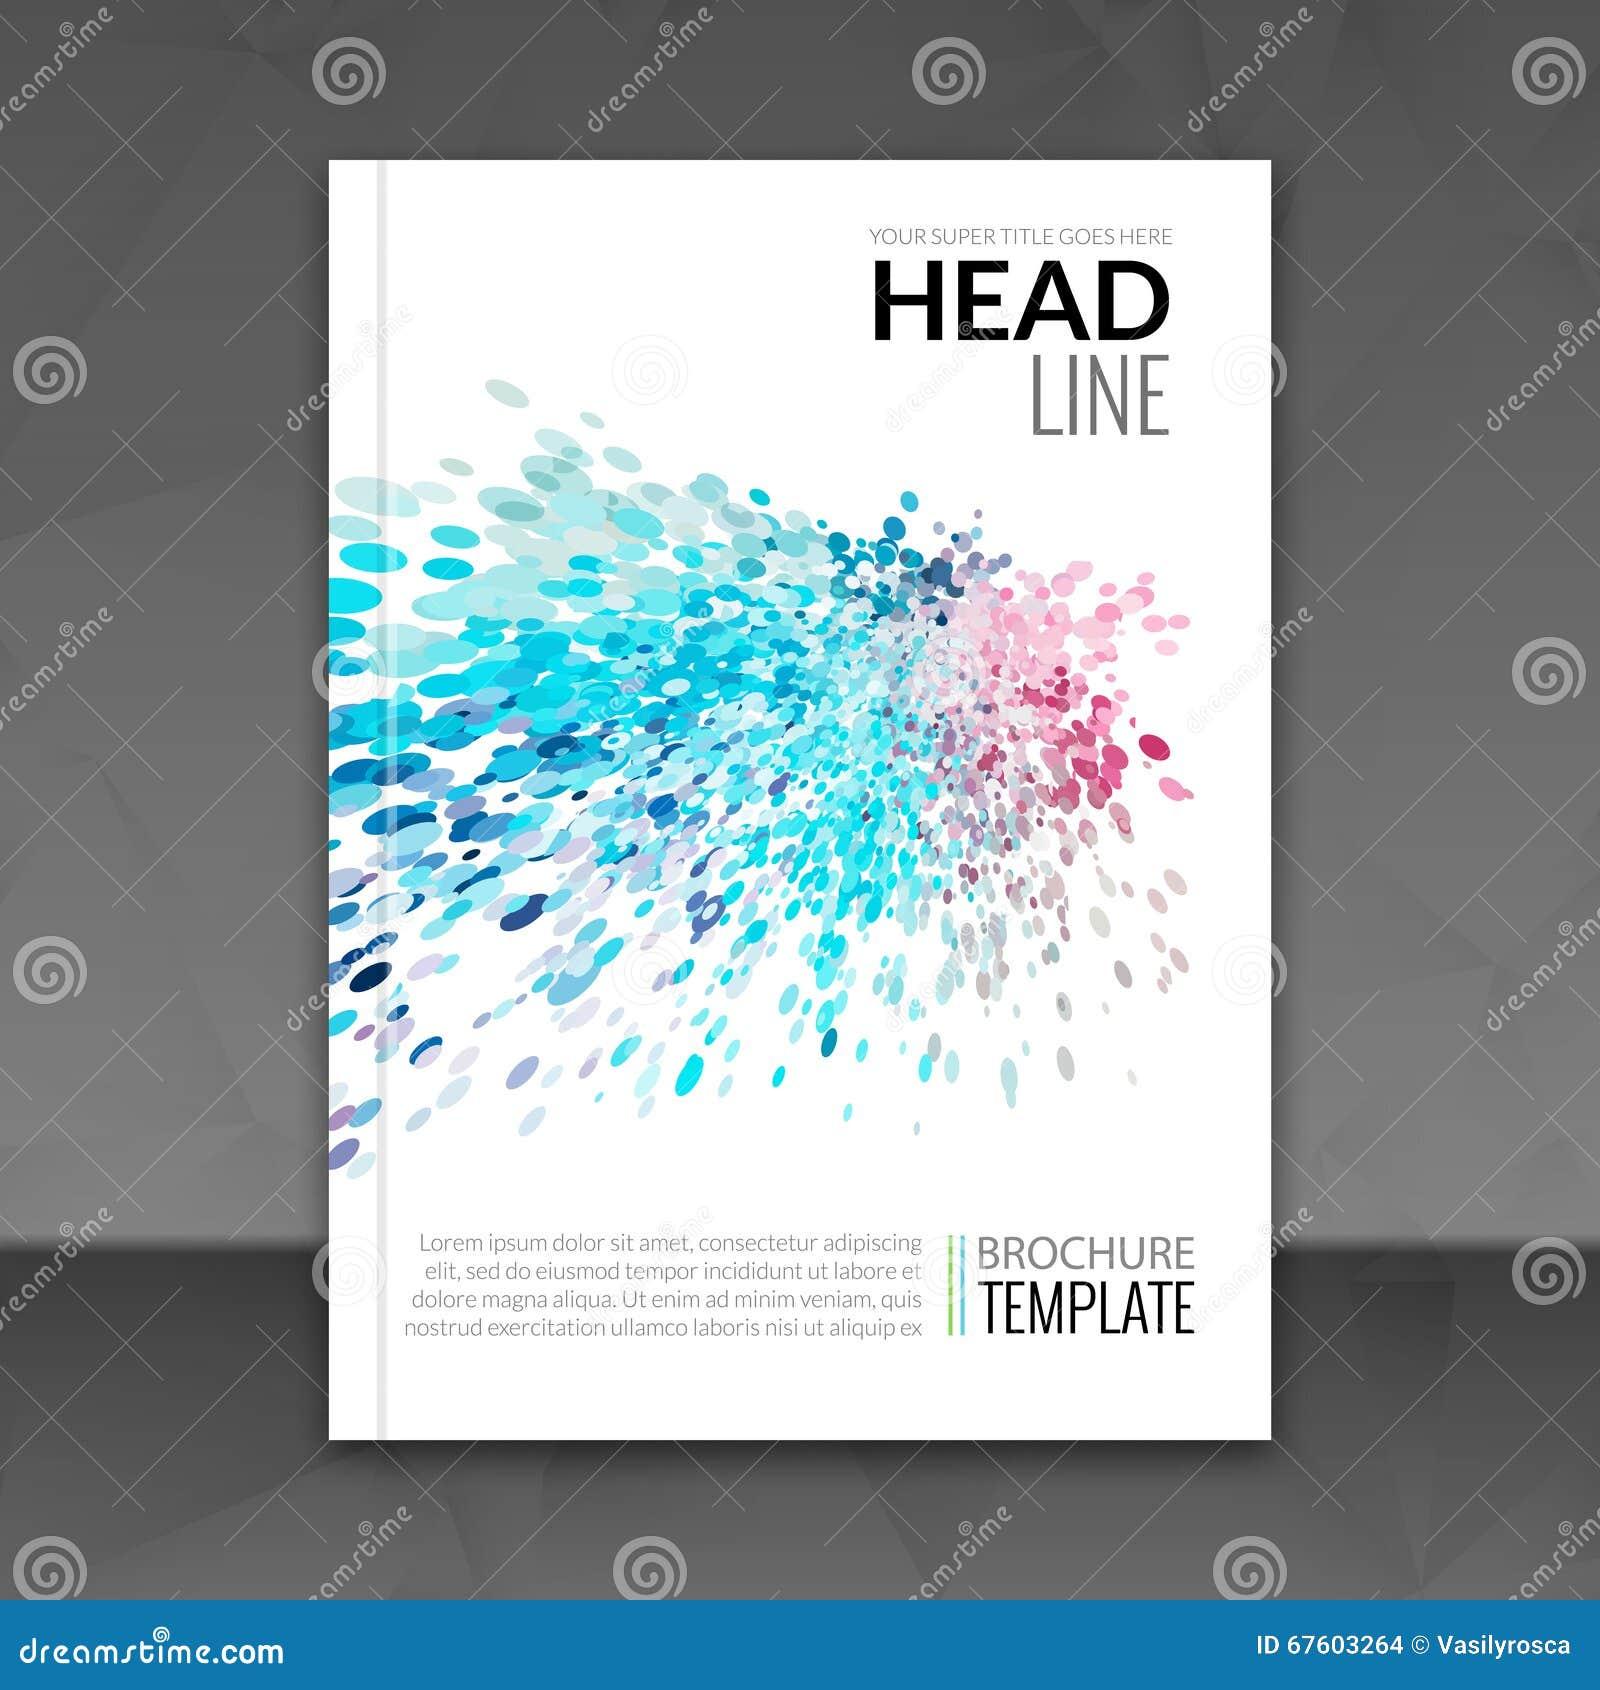 business report design flyer template background colorful business report design flyer template background colorful dots brochure cover template mockup